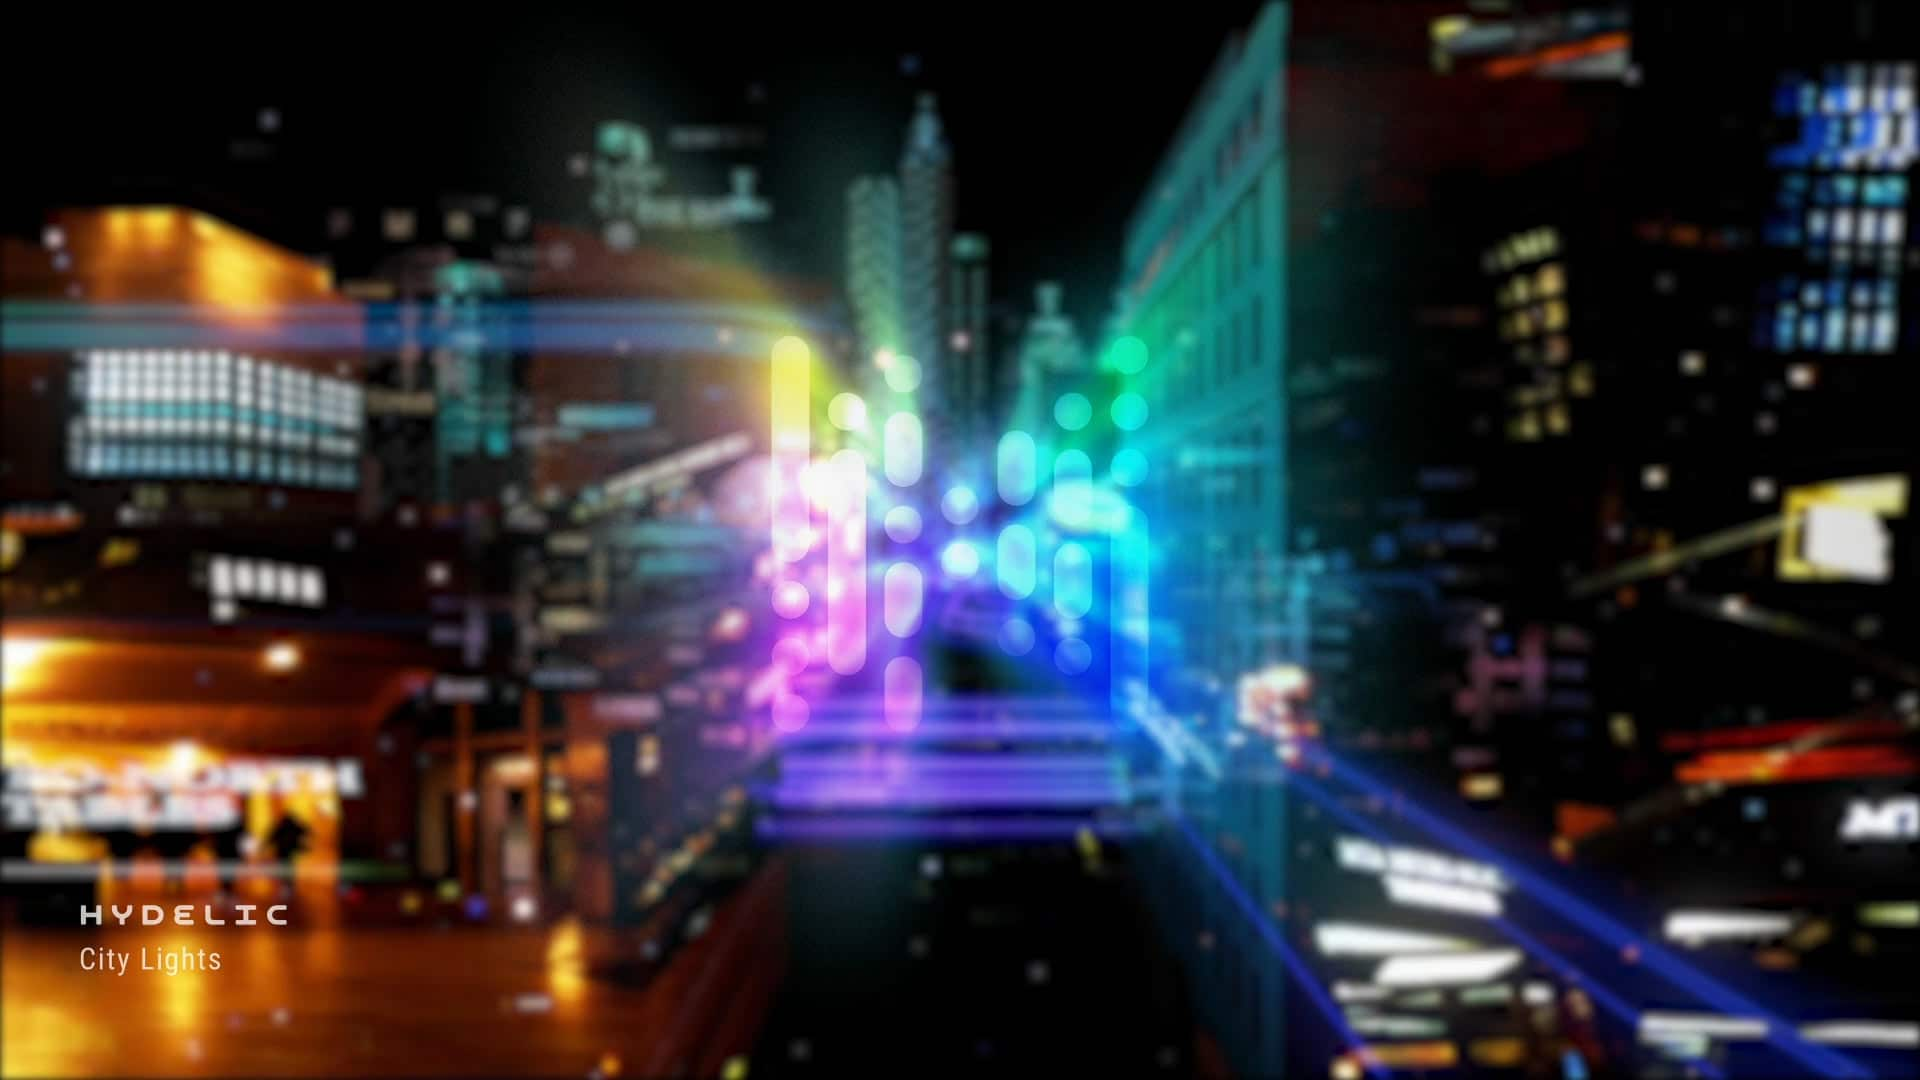 hydelic_CityLights